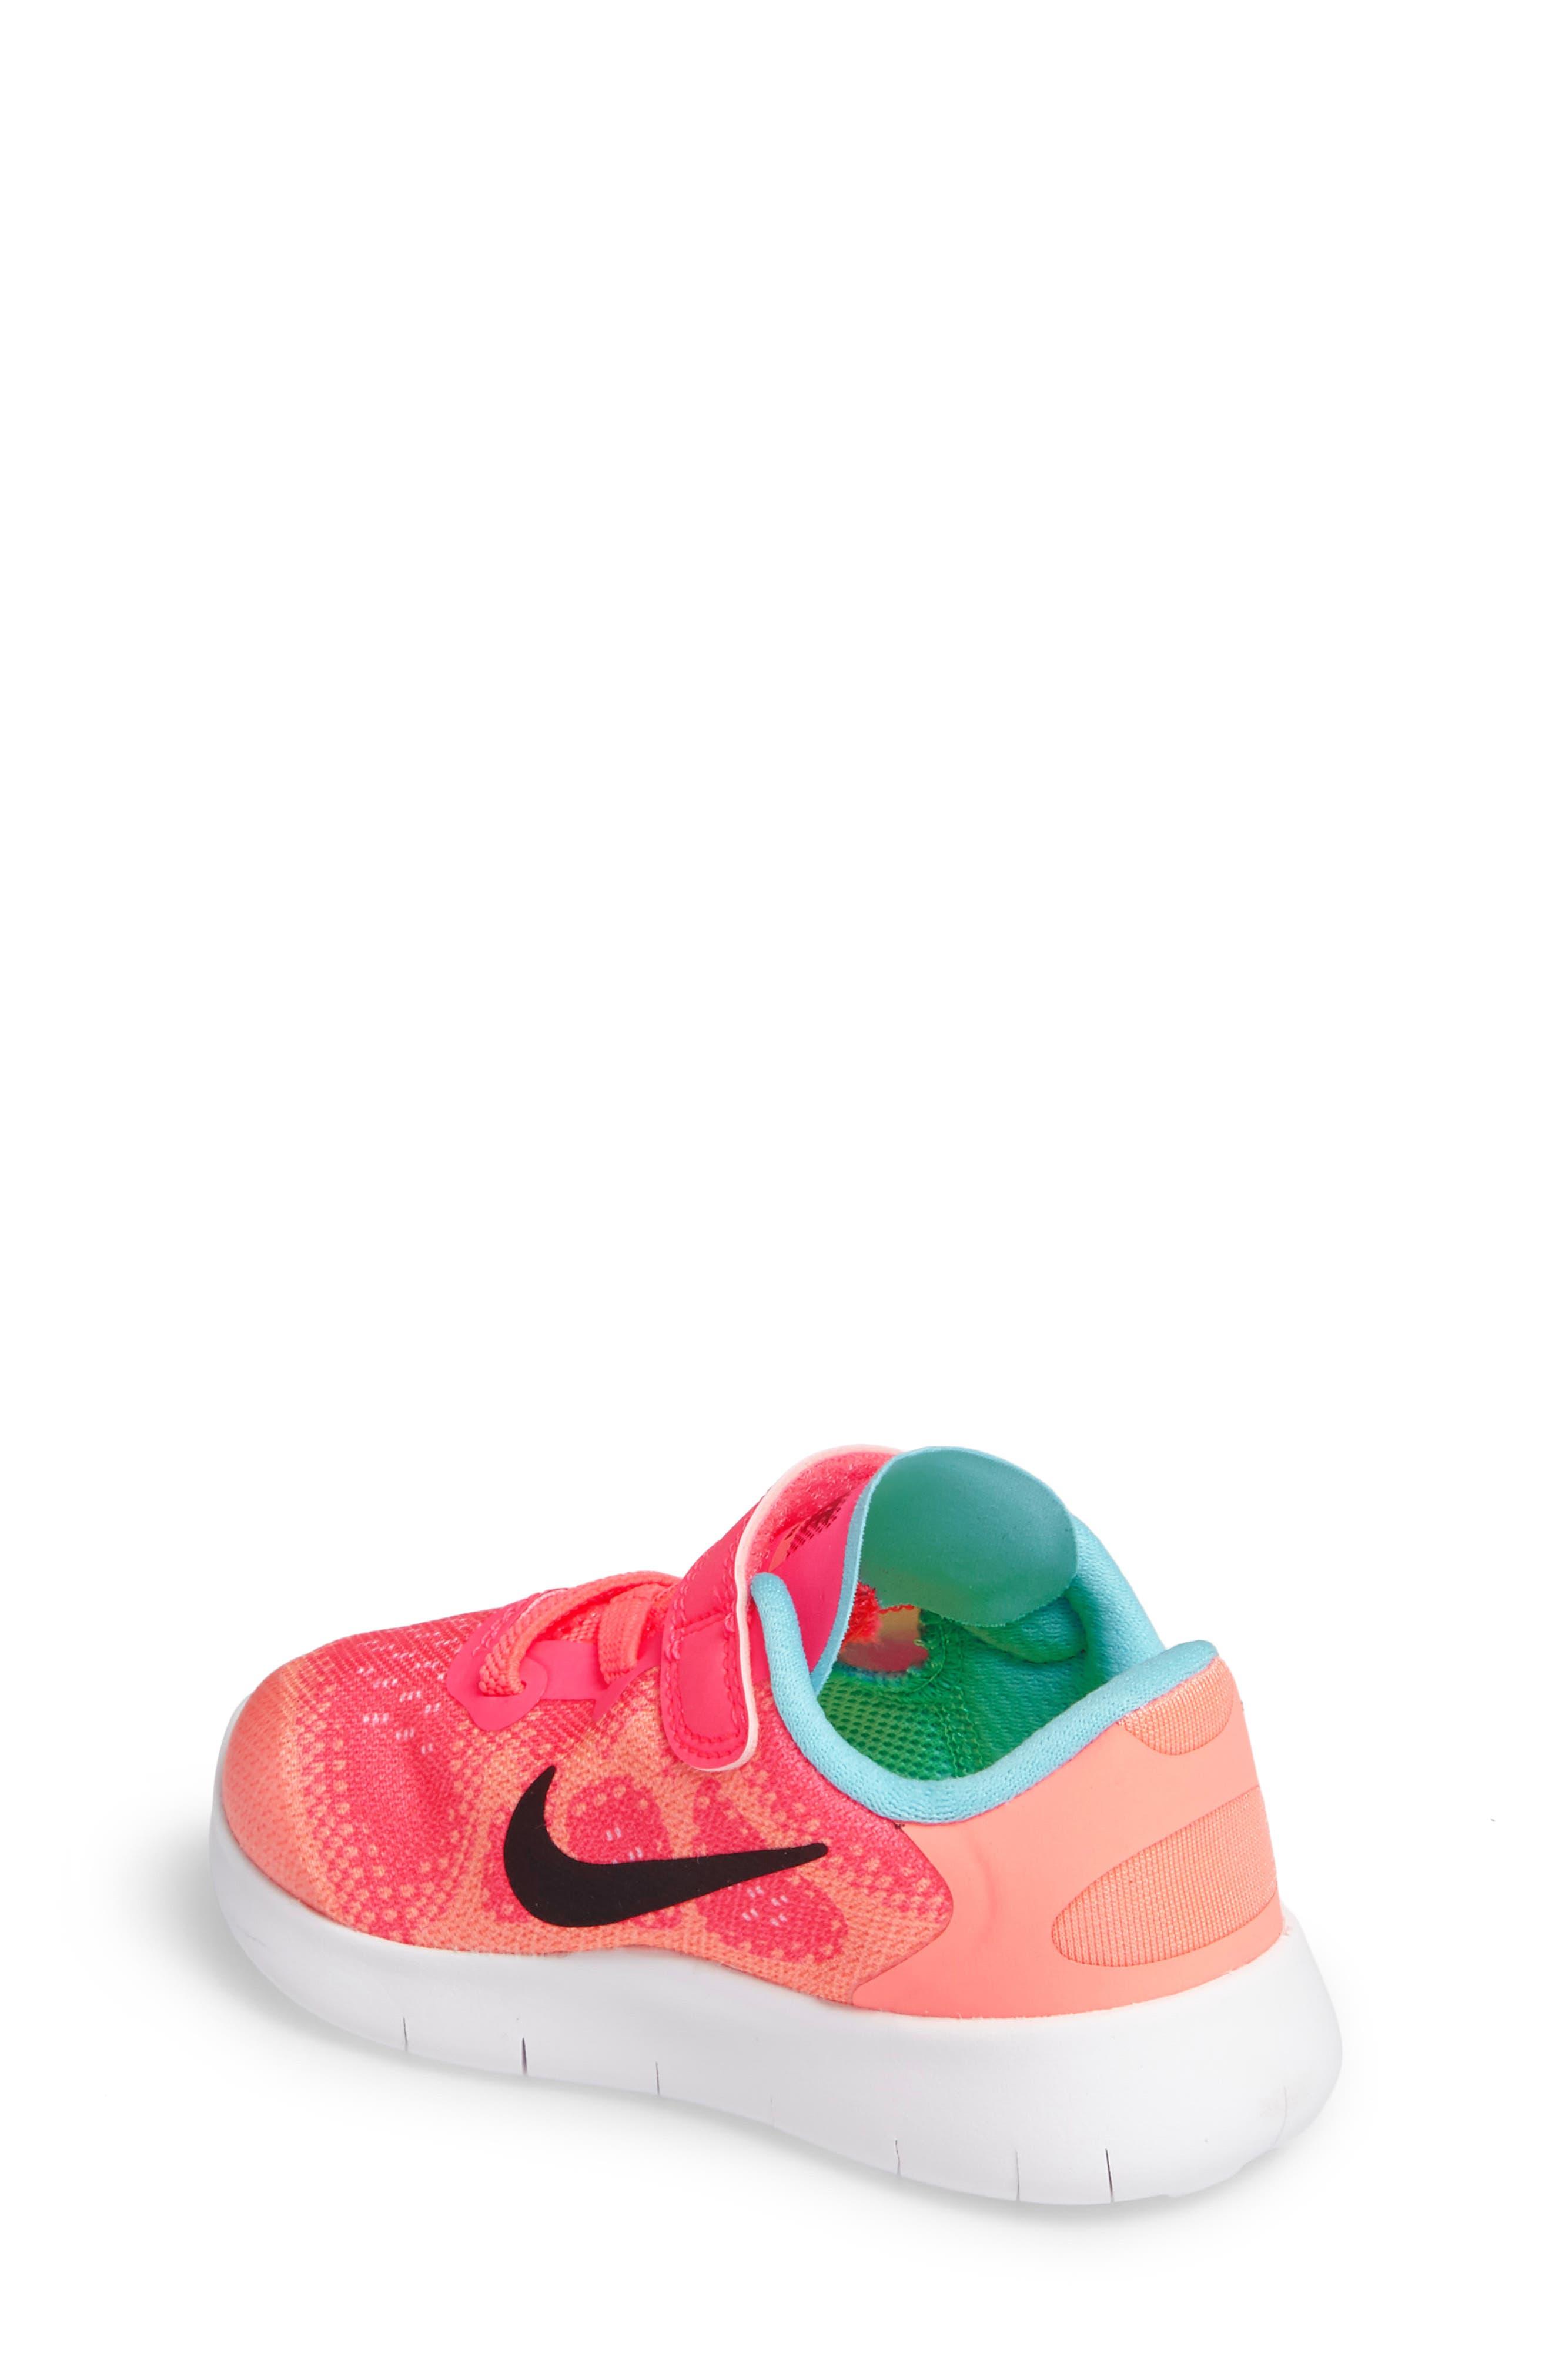 Alternate Image 2  - Nike Free Run 2017 Sneaker (Baby, Walker, Toddler & Little Kid)